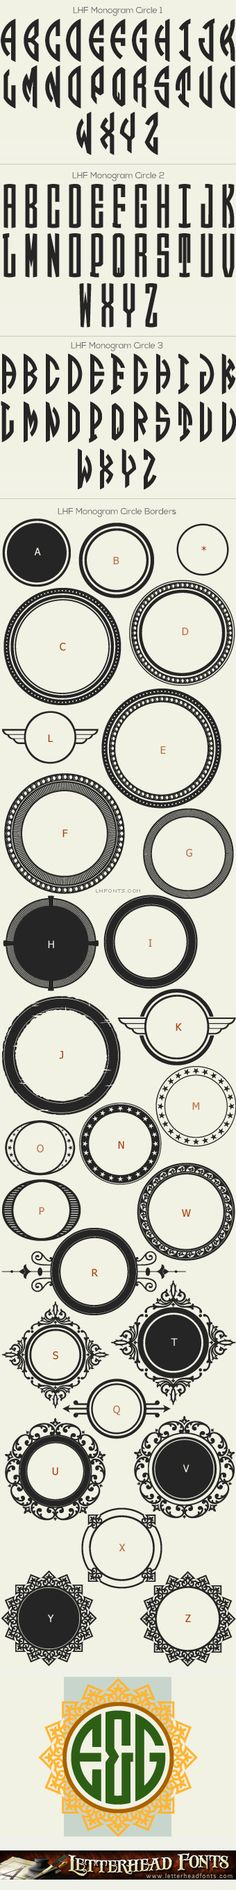 Letterhead Fonts / LHF Monogram Circle font set / Monogram Fonts